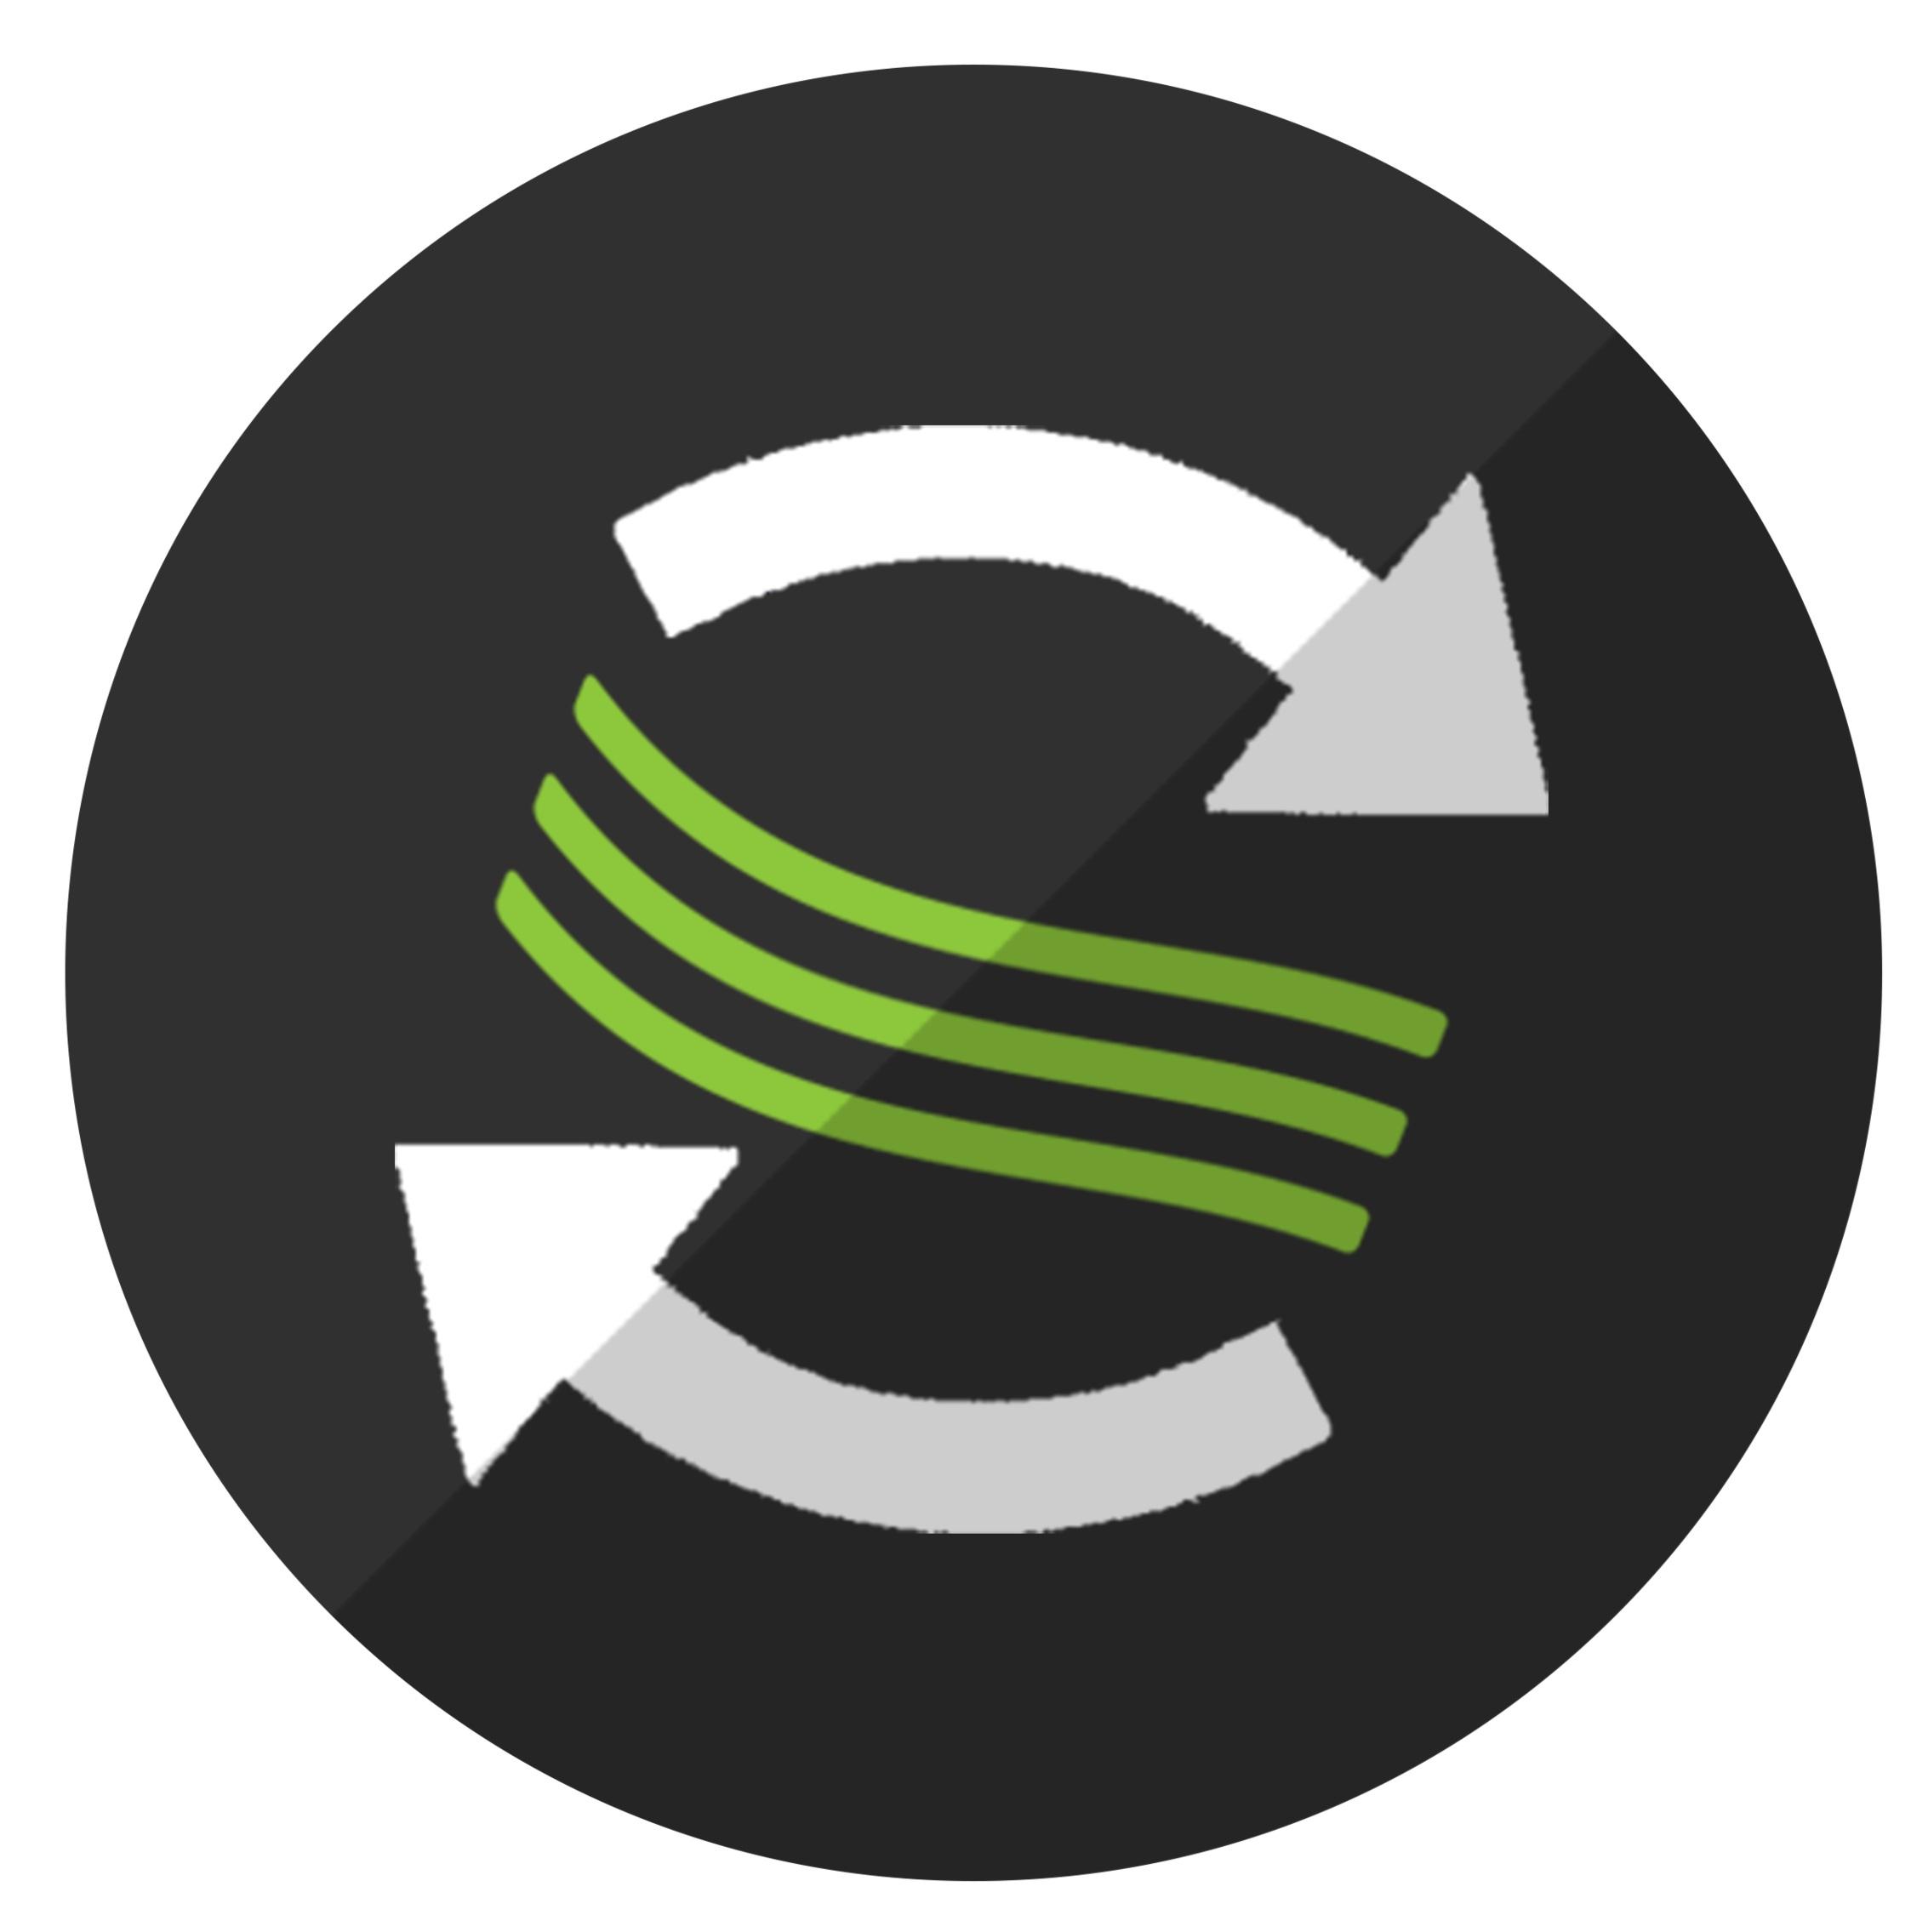 MVHR+%26+MEV+Installation+Circle+Icon.jpg